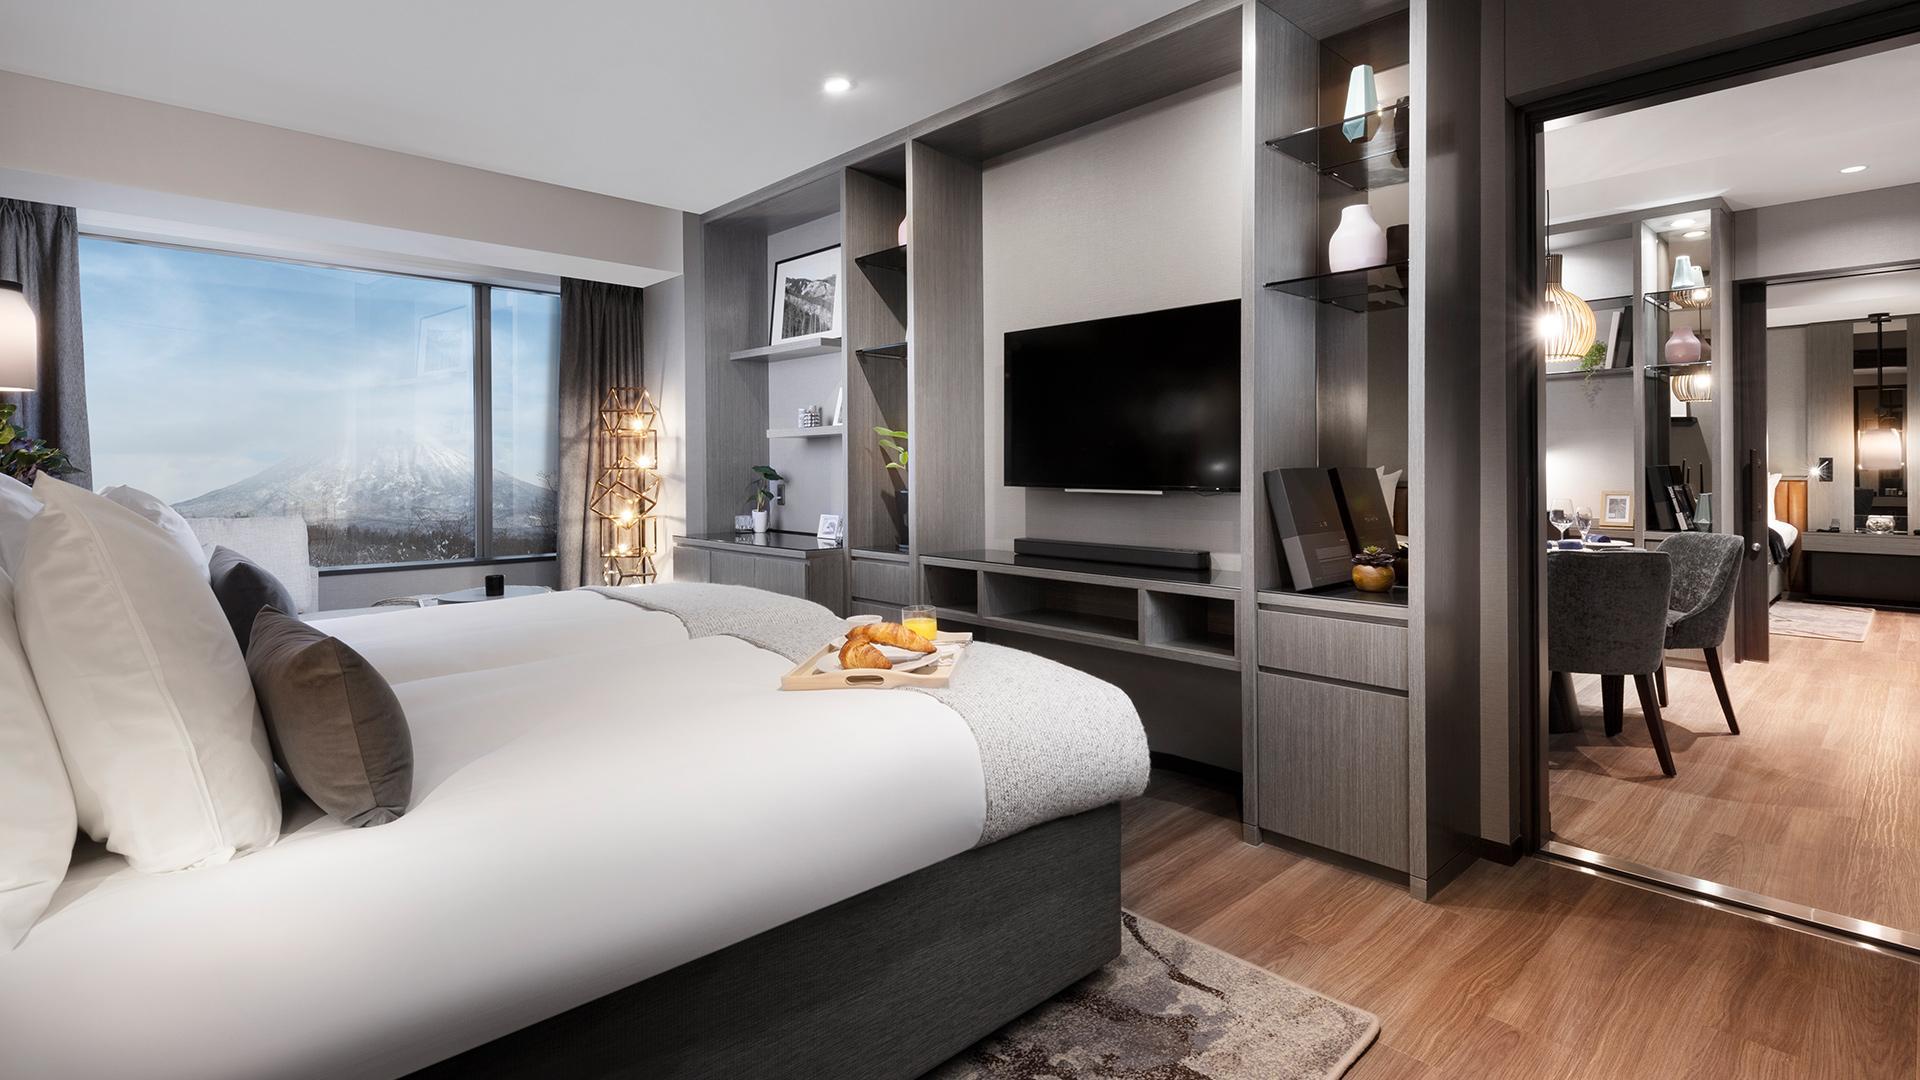 Three-Bedroom Suite (2020) image 1 at Hinode Hills Niseko Village by Abuta-gun, Hokkaido, Japan